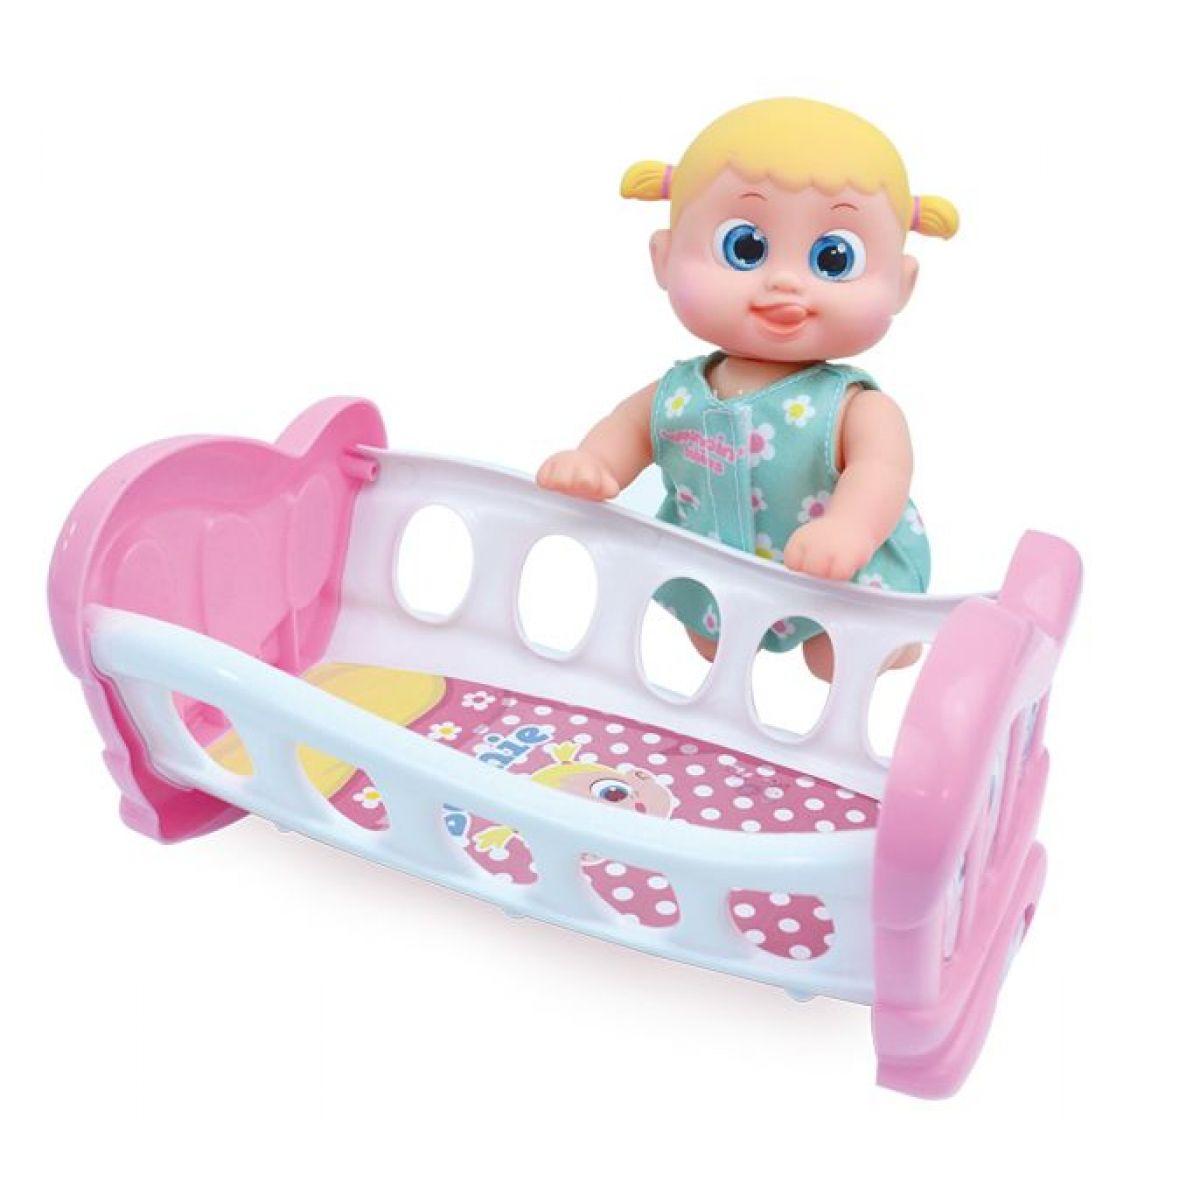 Bábätko Bouncin Babies v postieľke Bounie